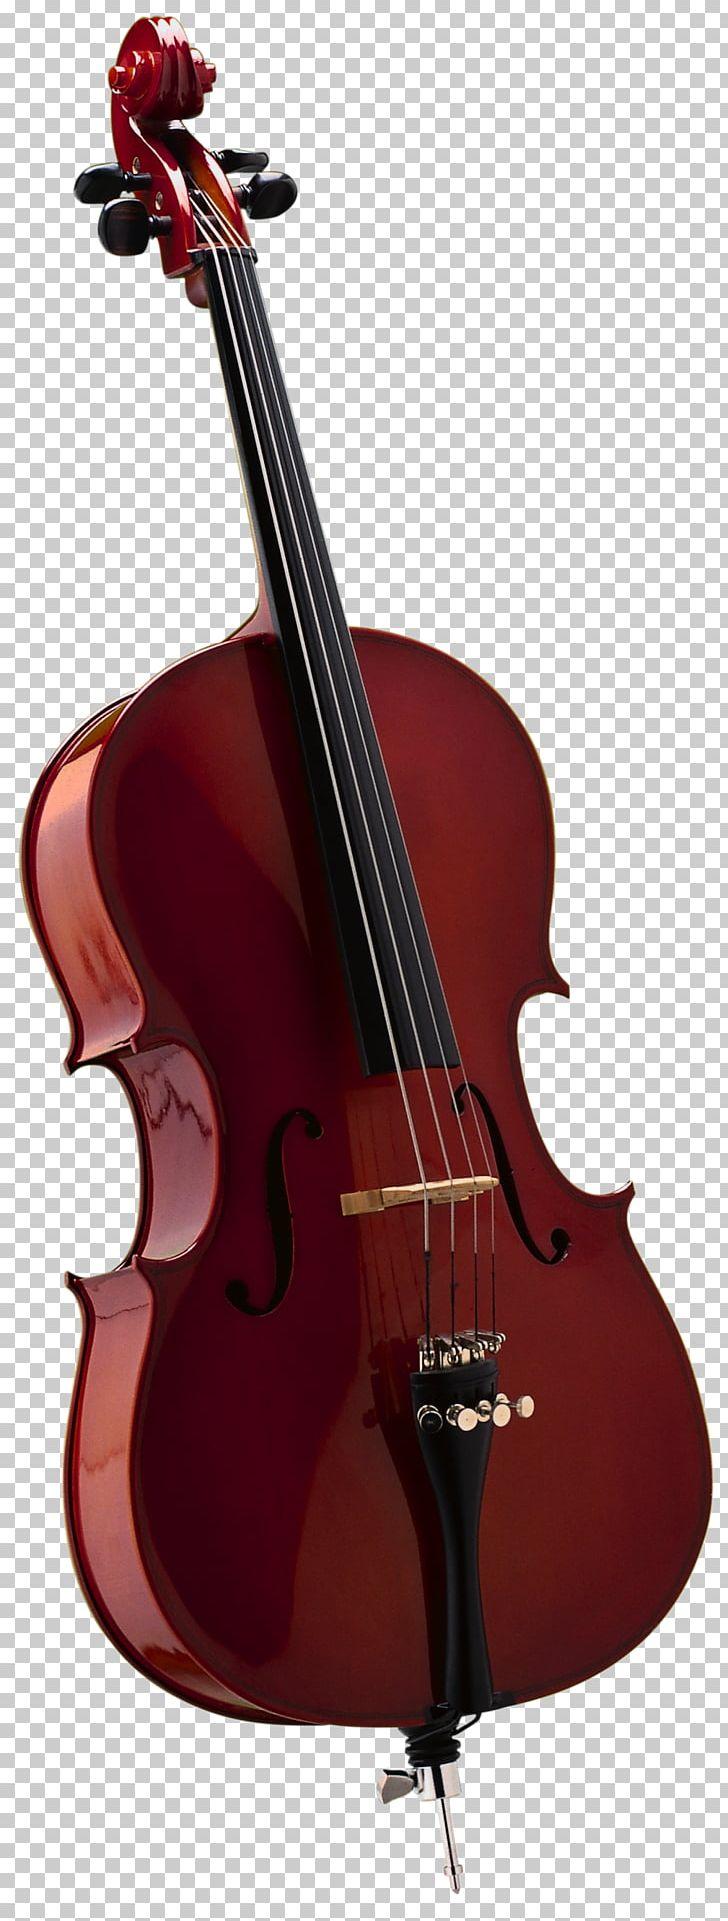 Musical Instruments Cello Violin String Instruments PNG, Clipart, Bass Guitar, Bass Violin, Bowed String Instrument, Cellist, Cello Free PNG Download